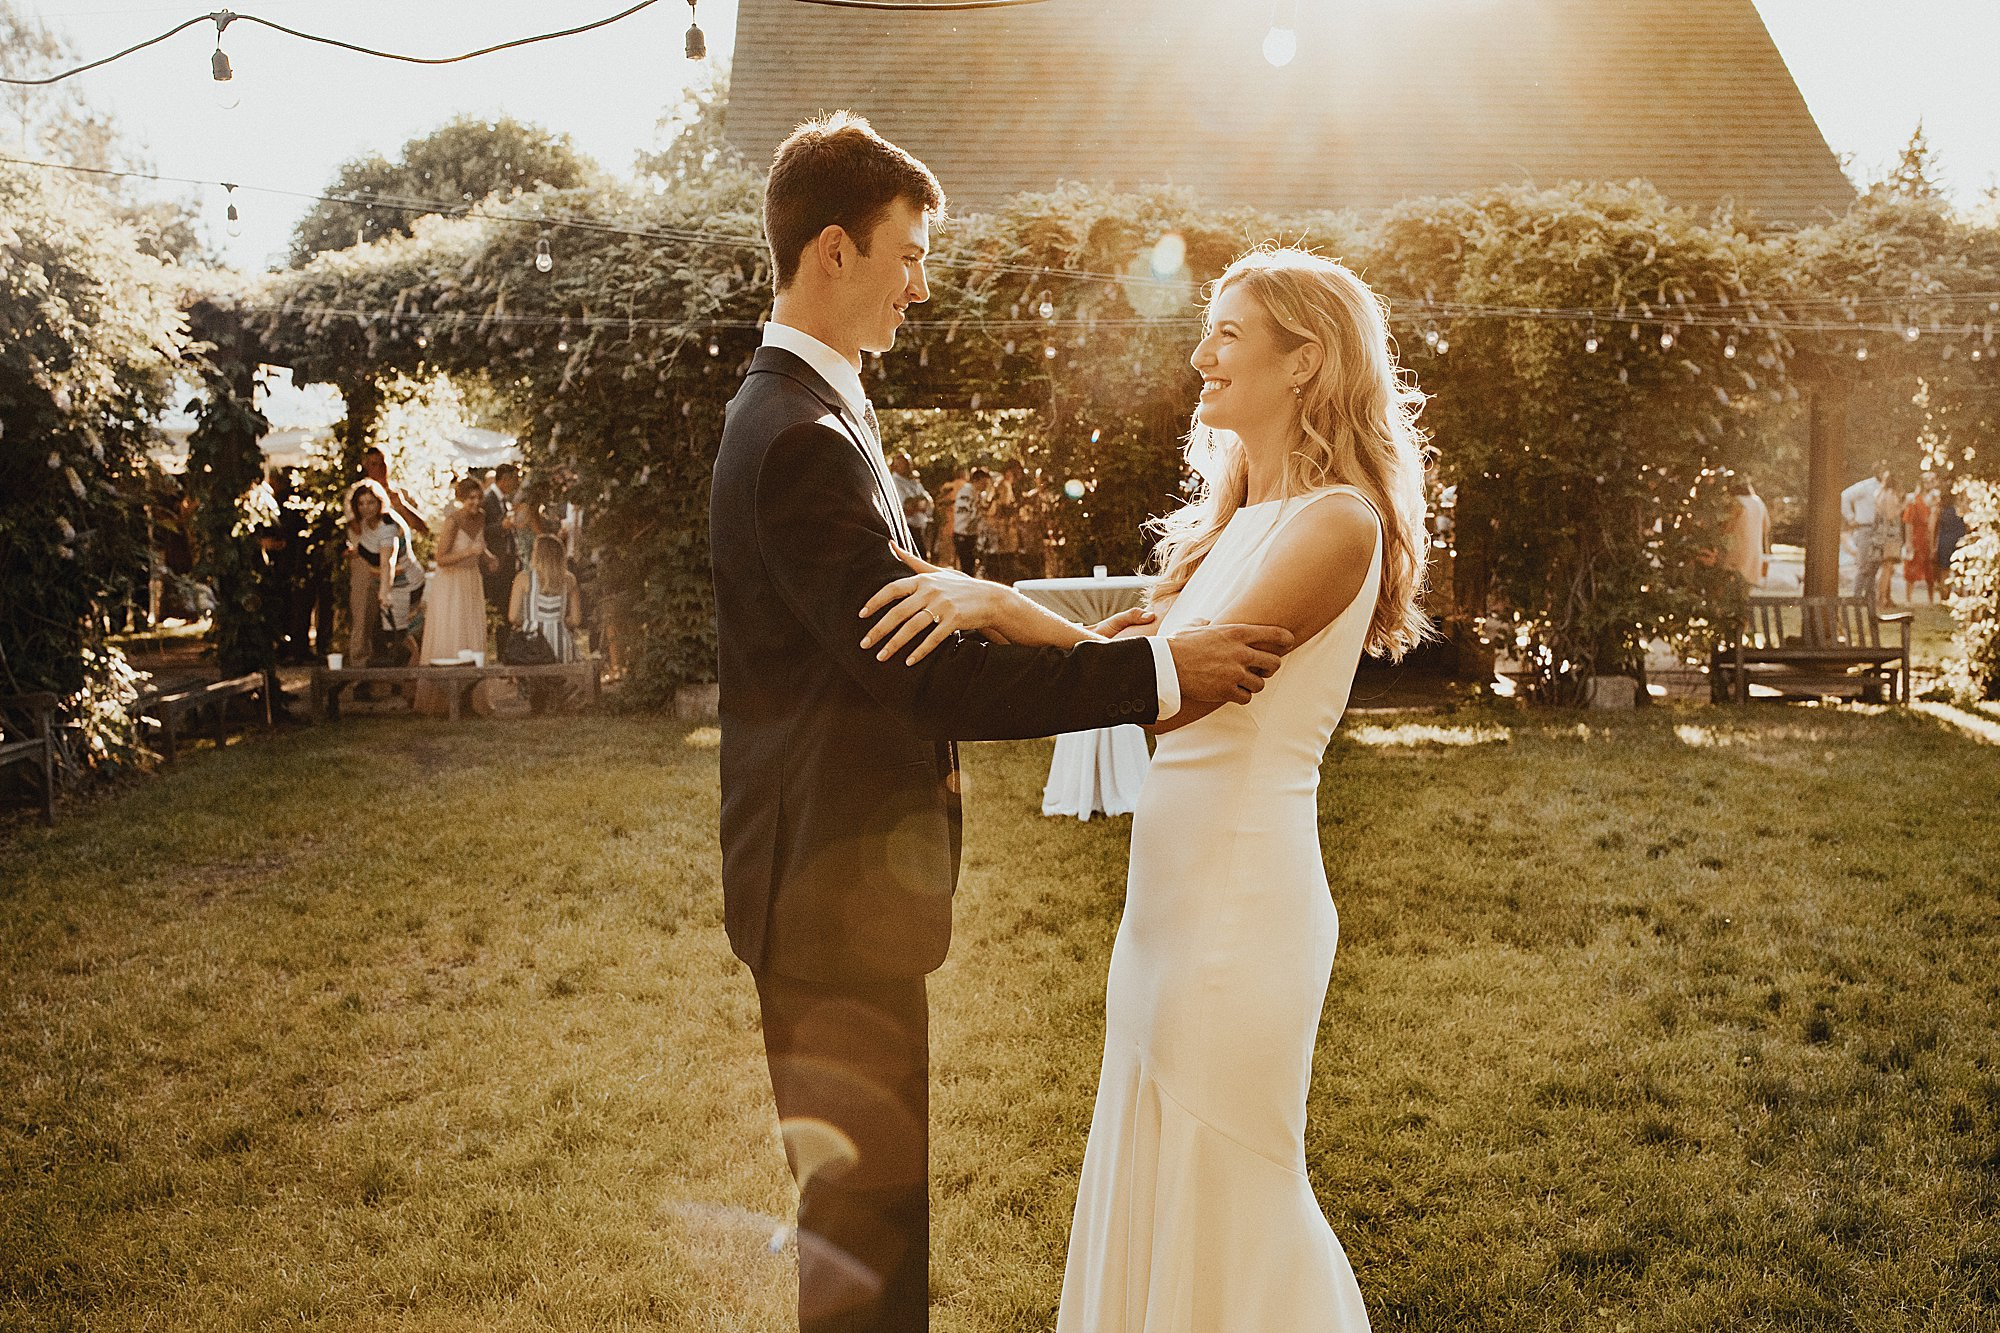 brylie-ryan-stonehaven-barn-wedding-152.jpg